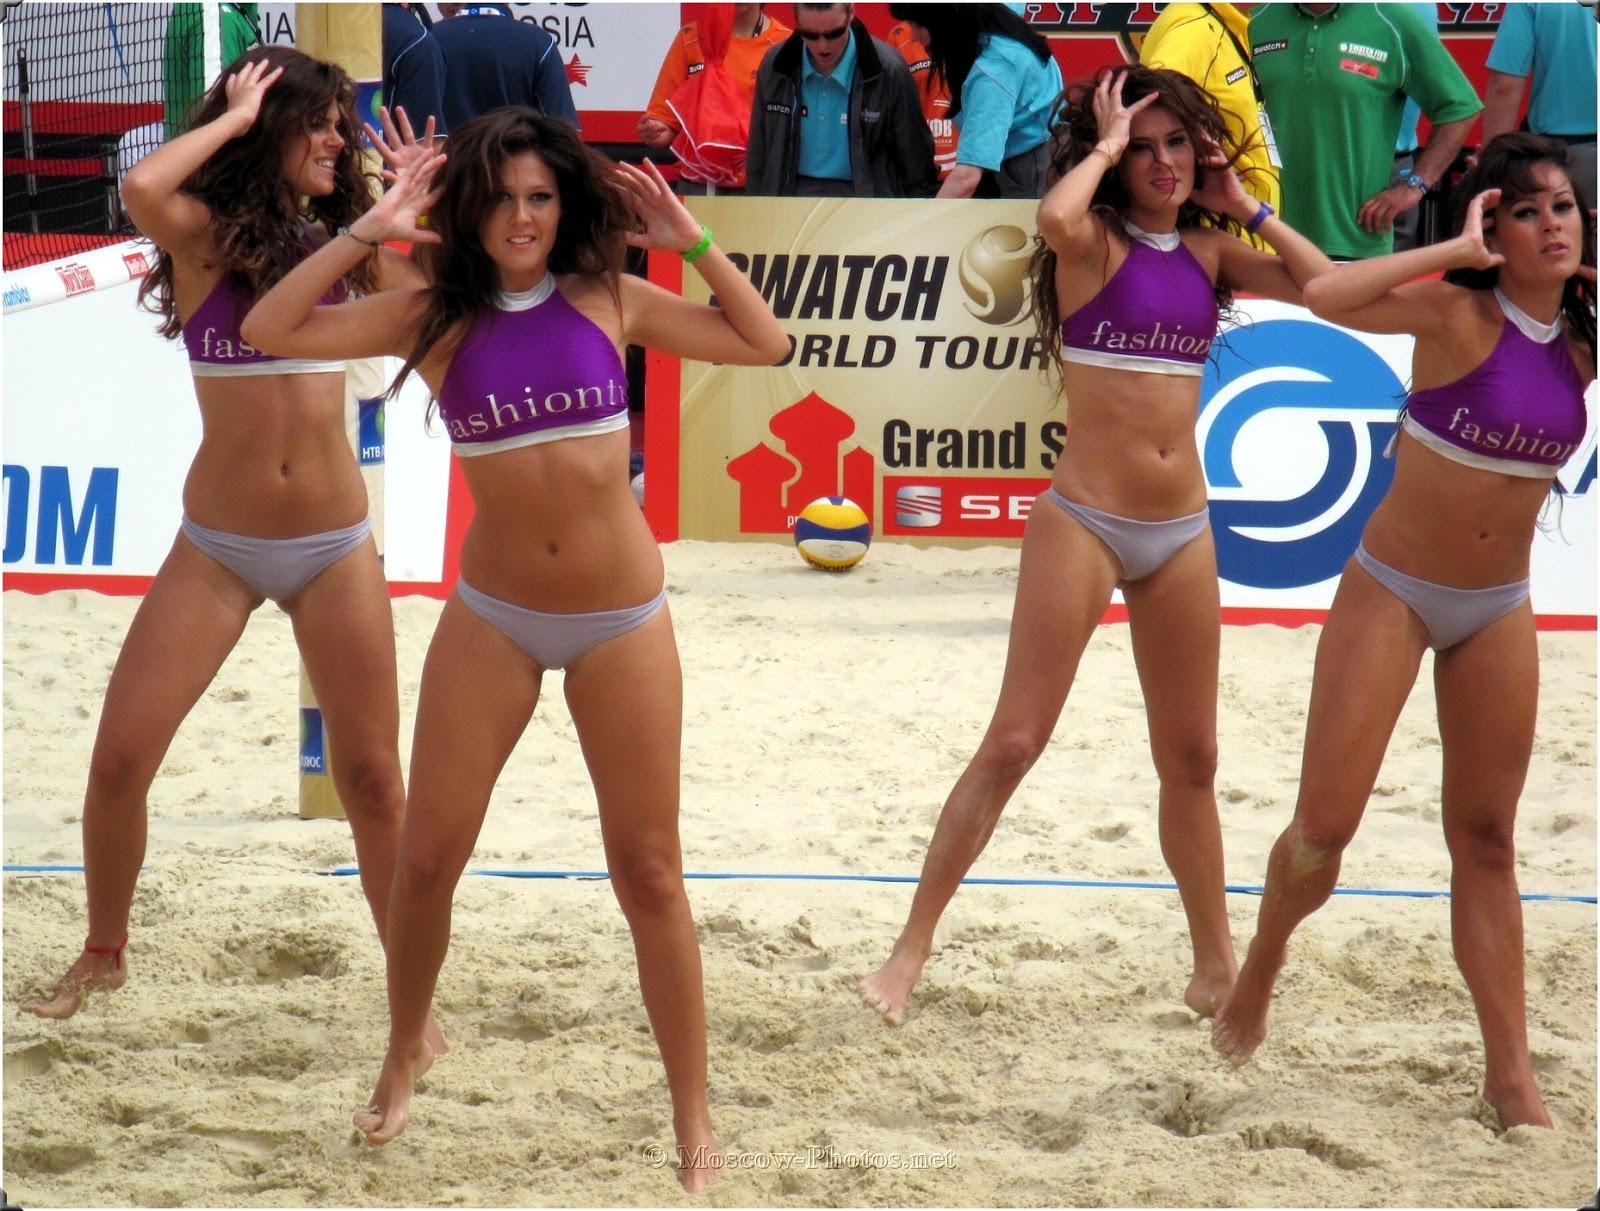 Beach Volley Cheerleaders in Moscow